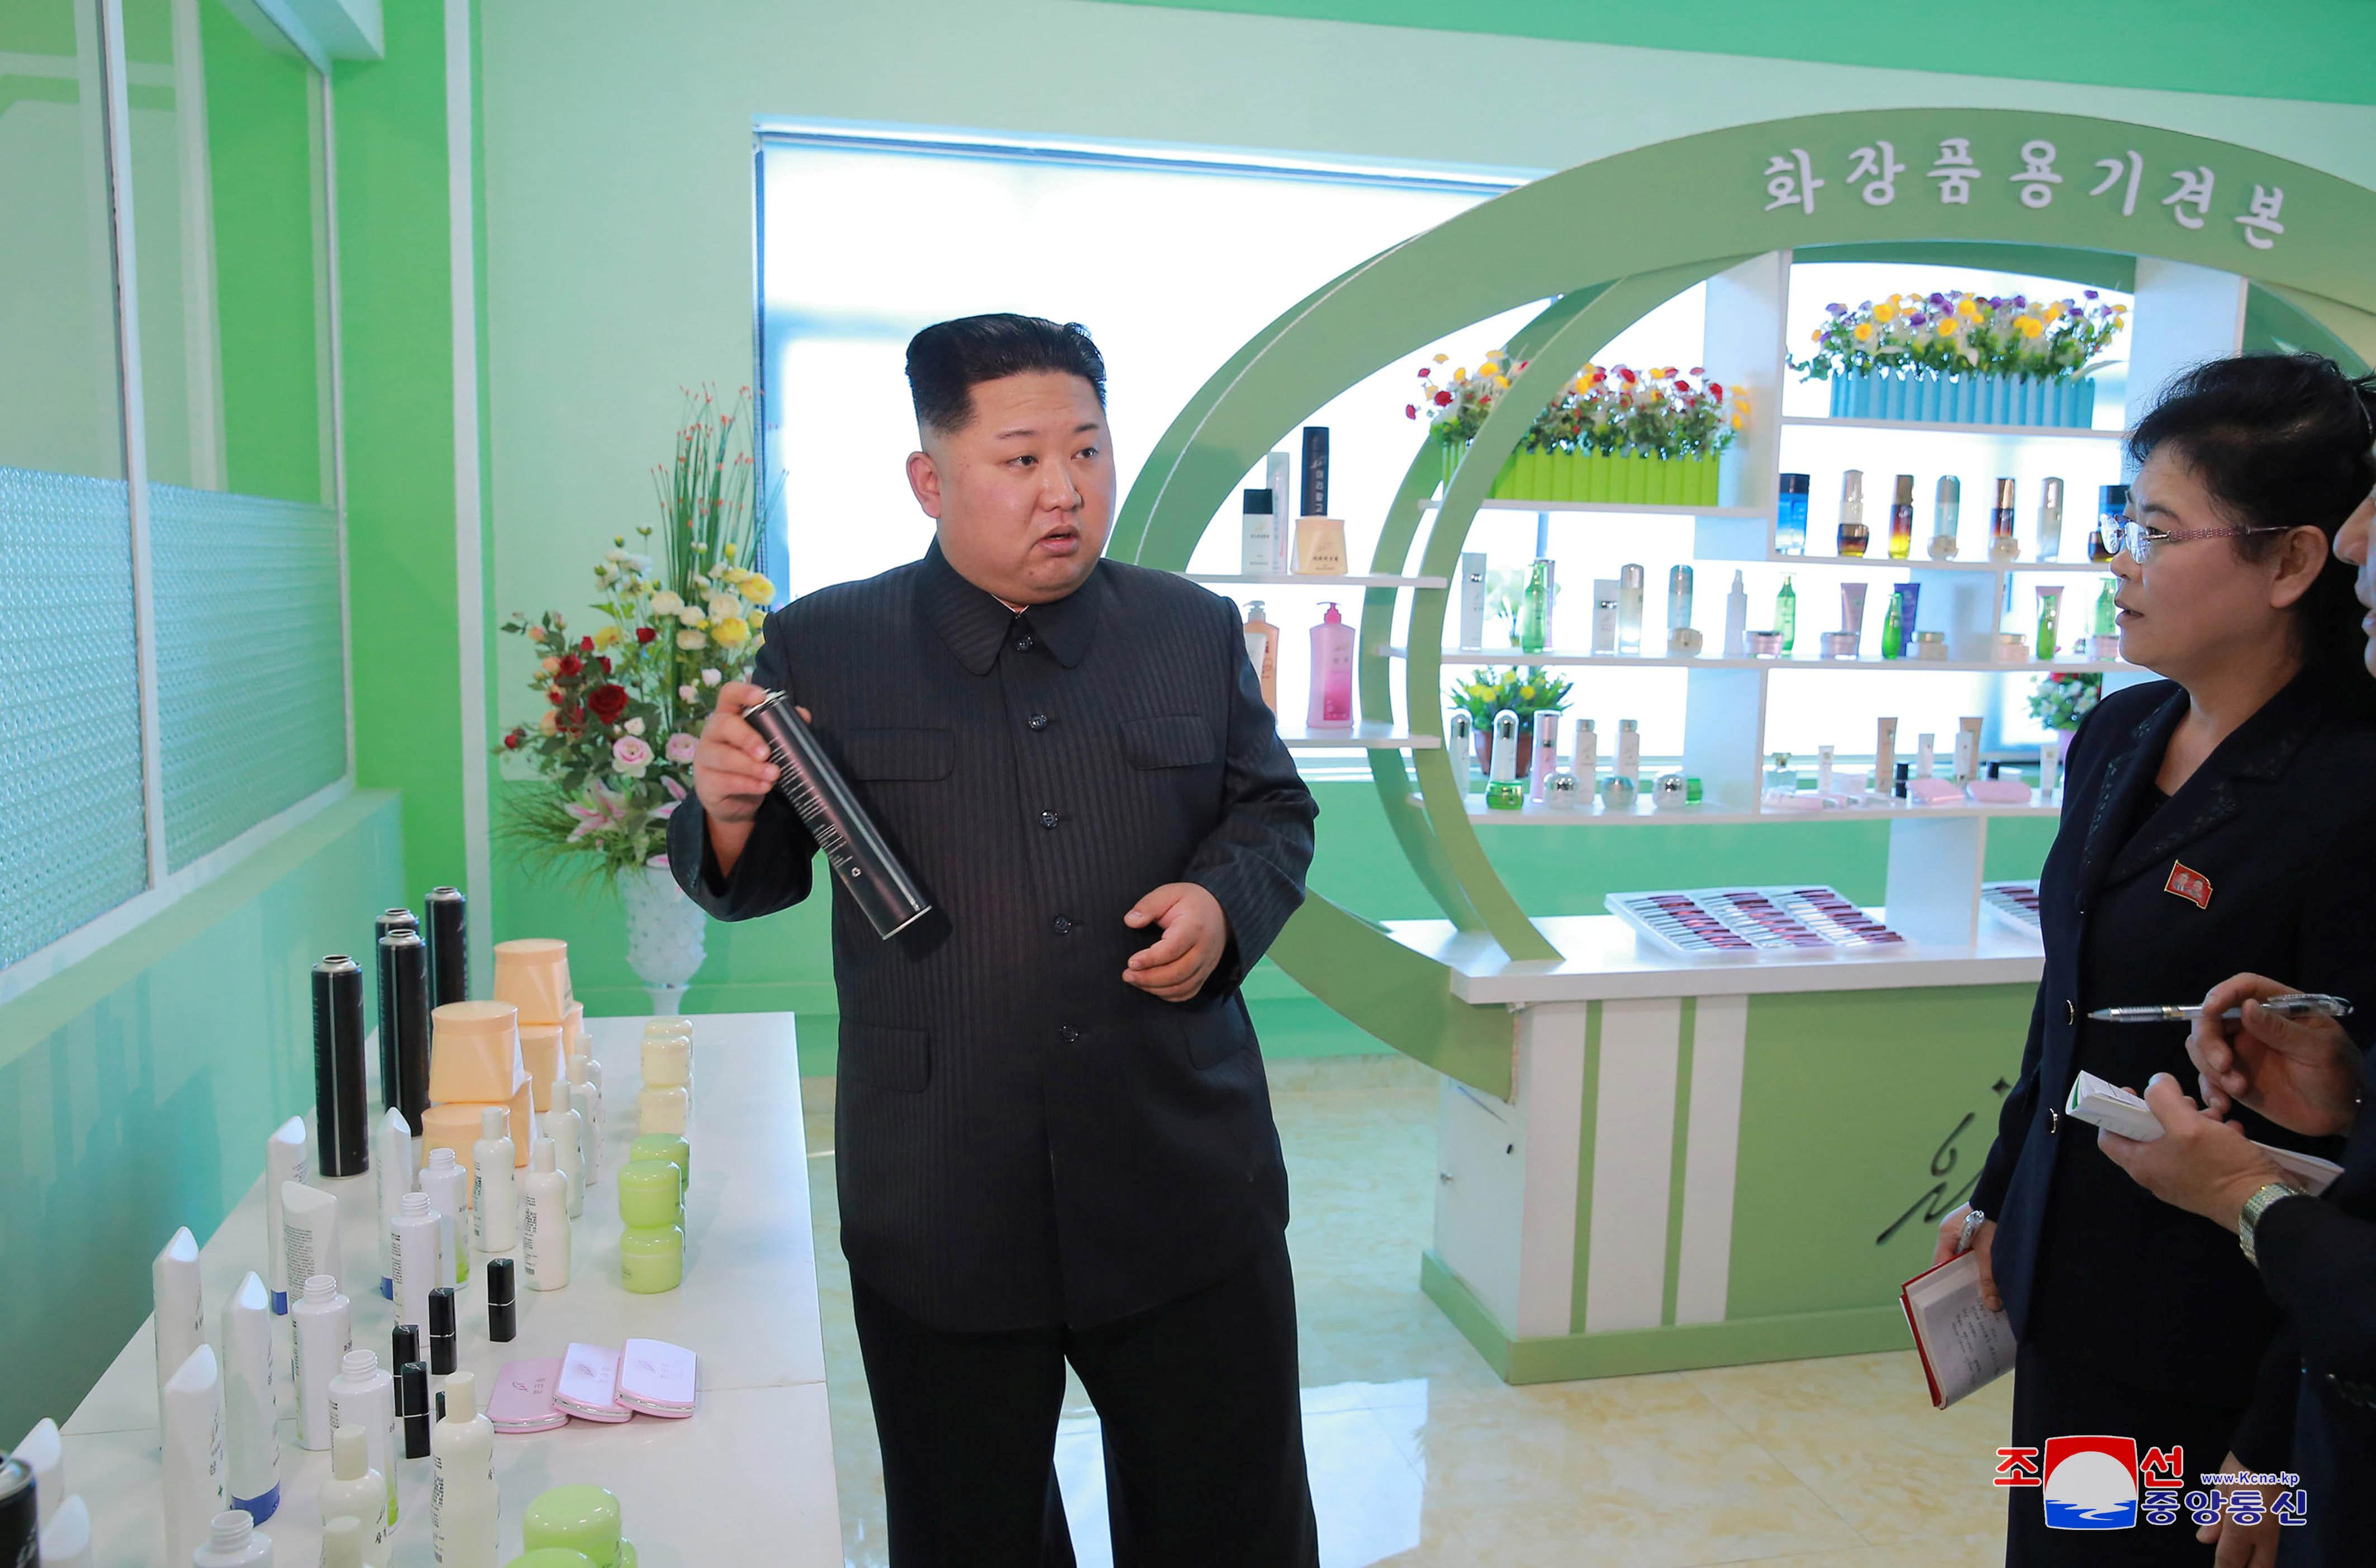 Kim Jong Un at the Pyongyang Cosmetics Factory in 2017.